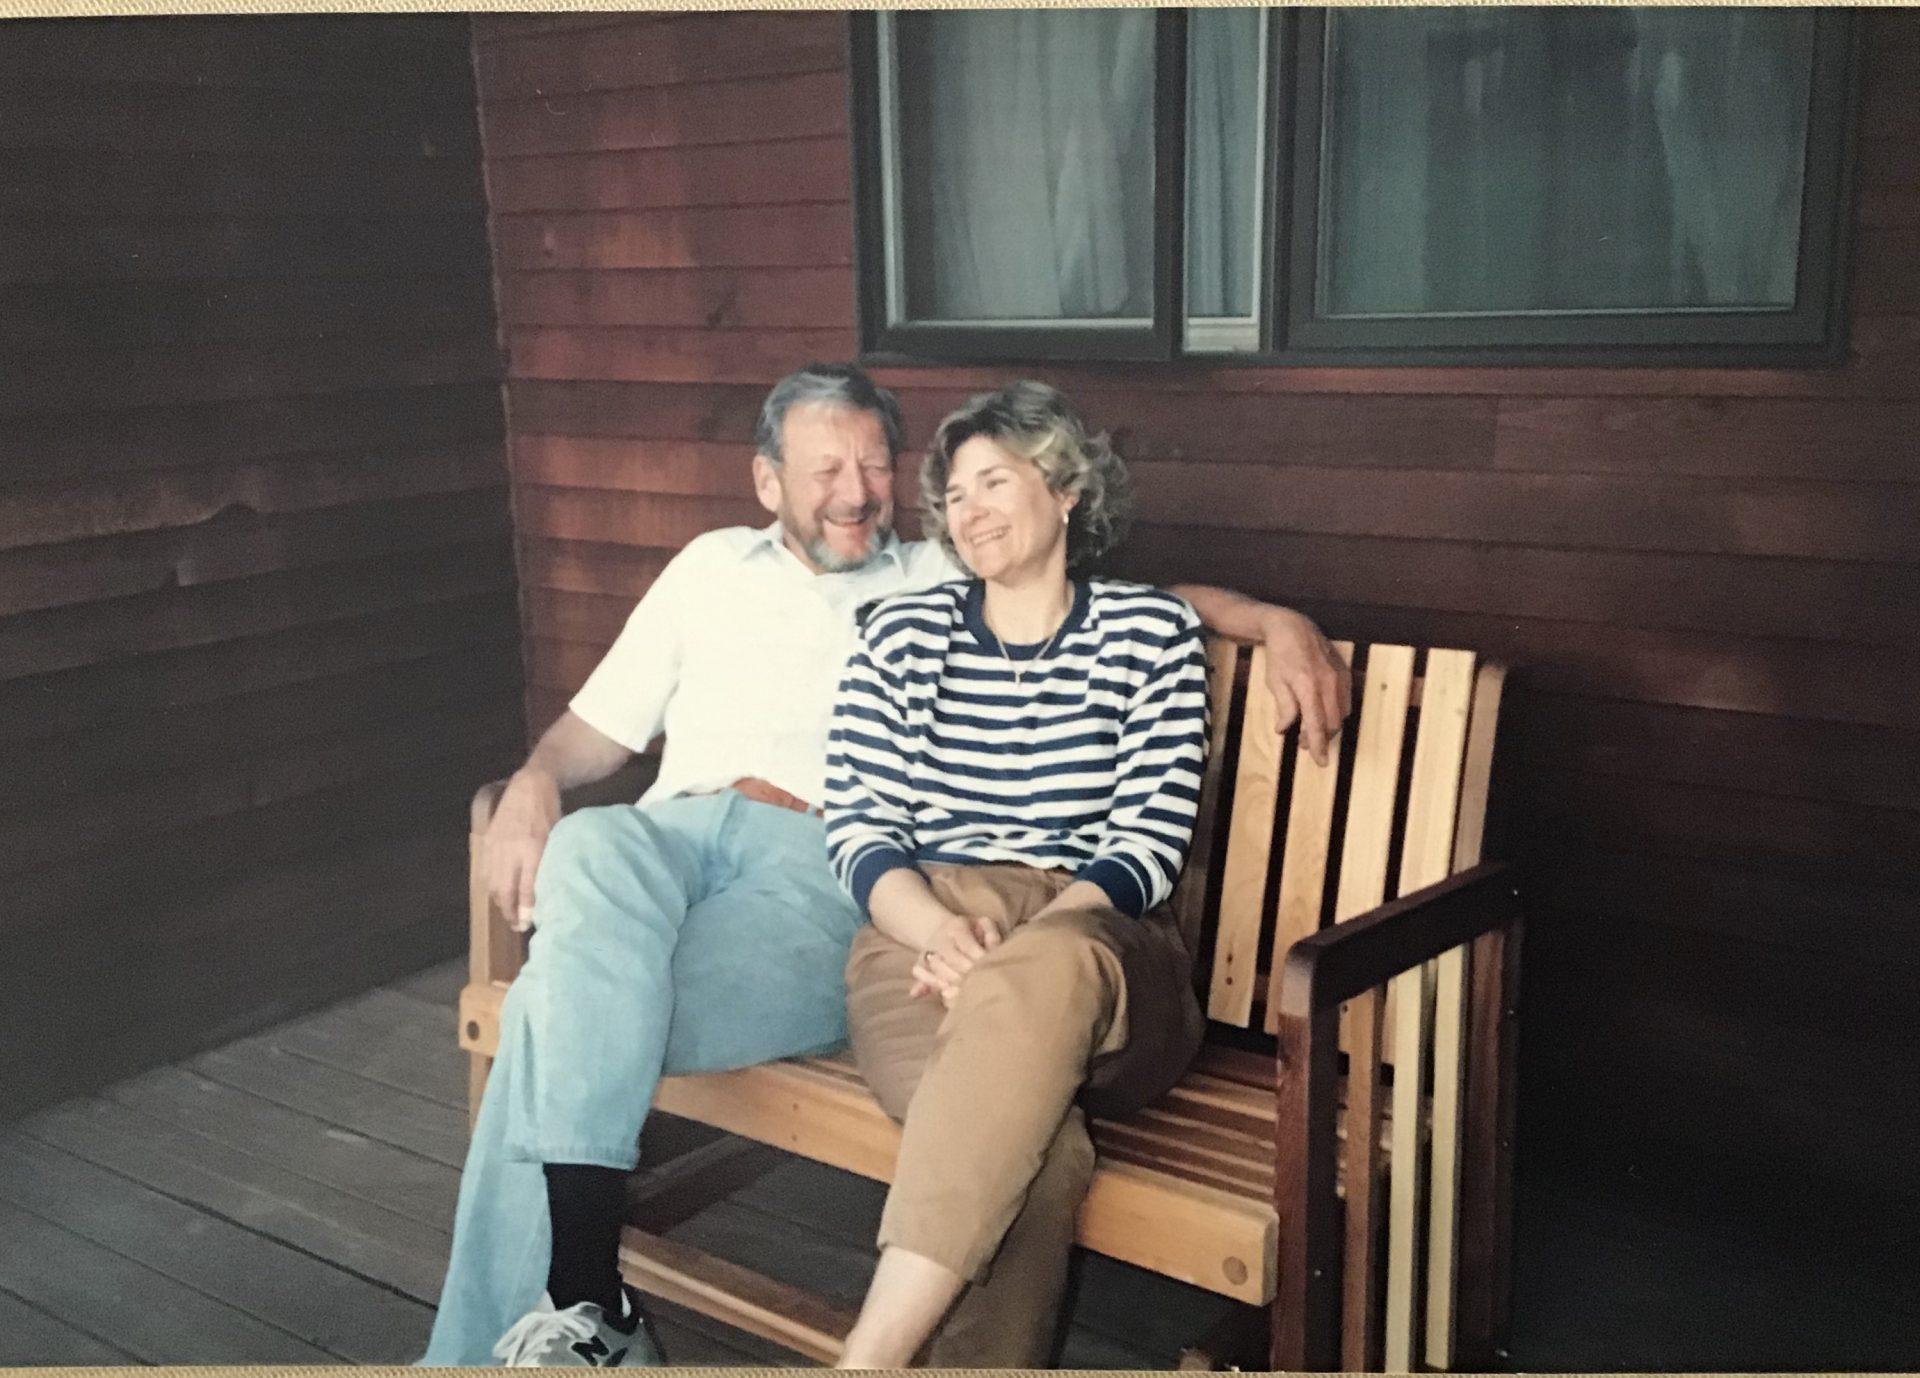 Joe and Gail, Stonington, CT, 1991.